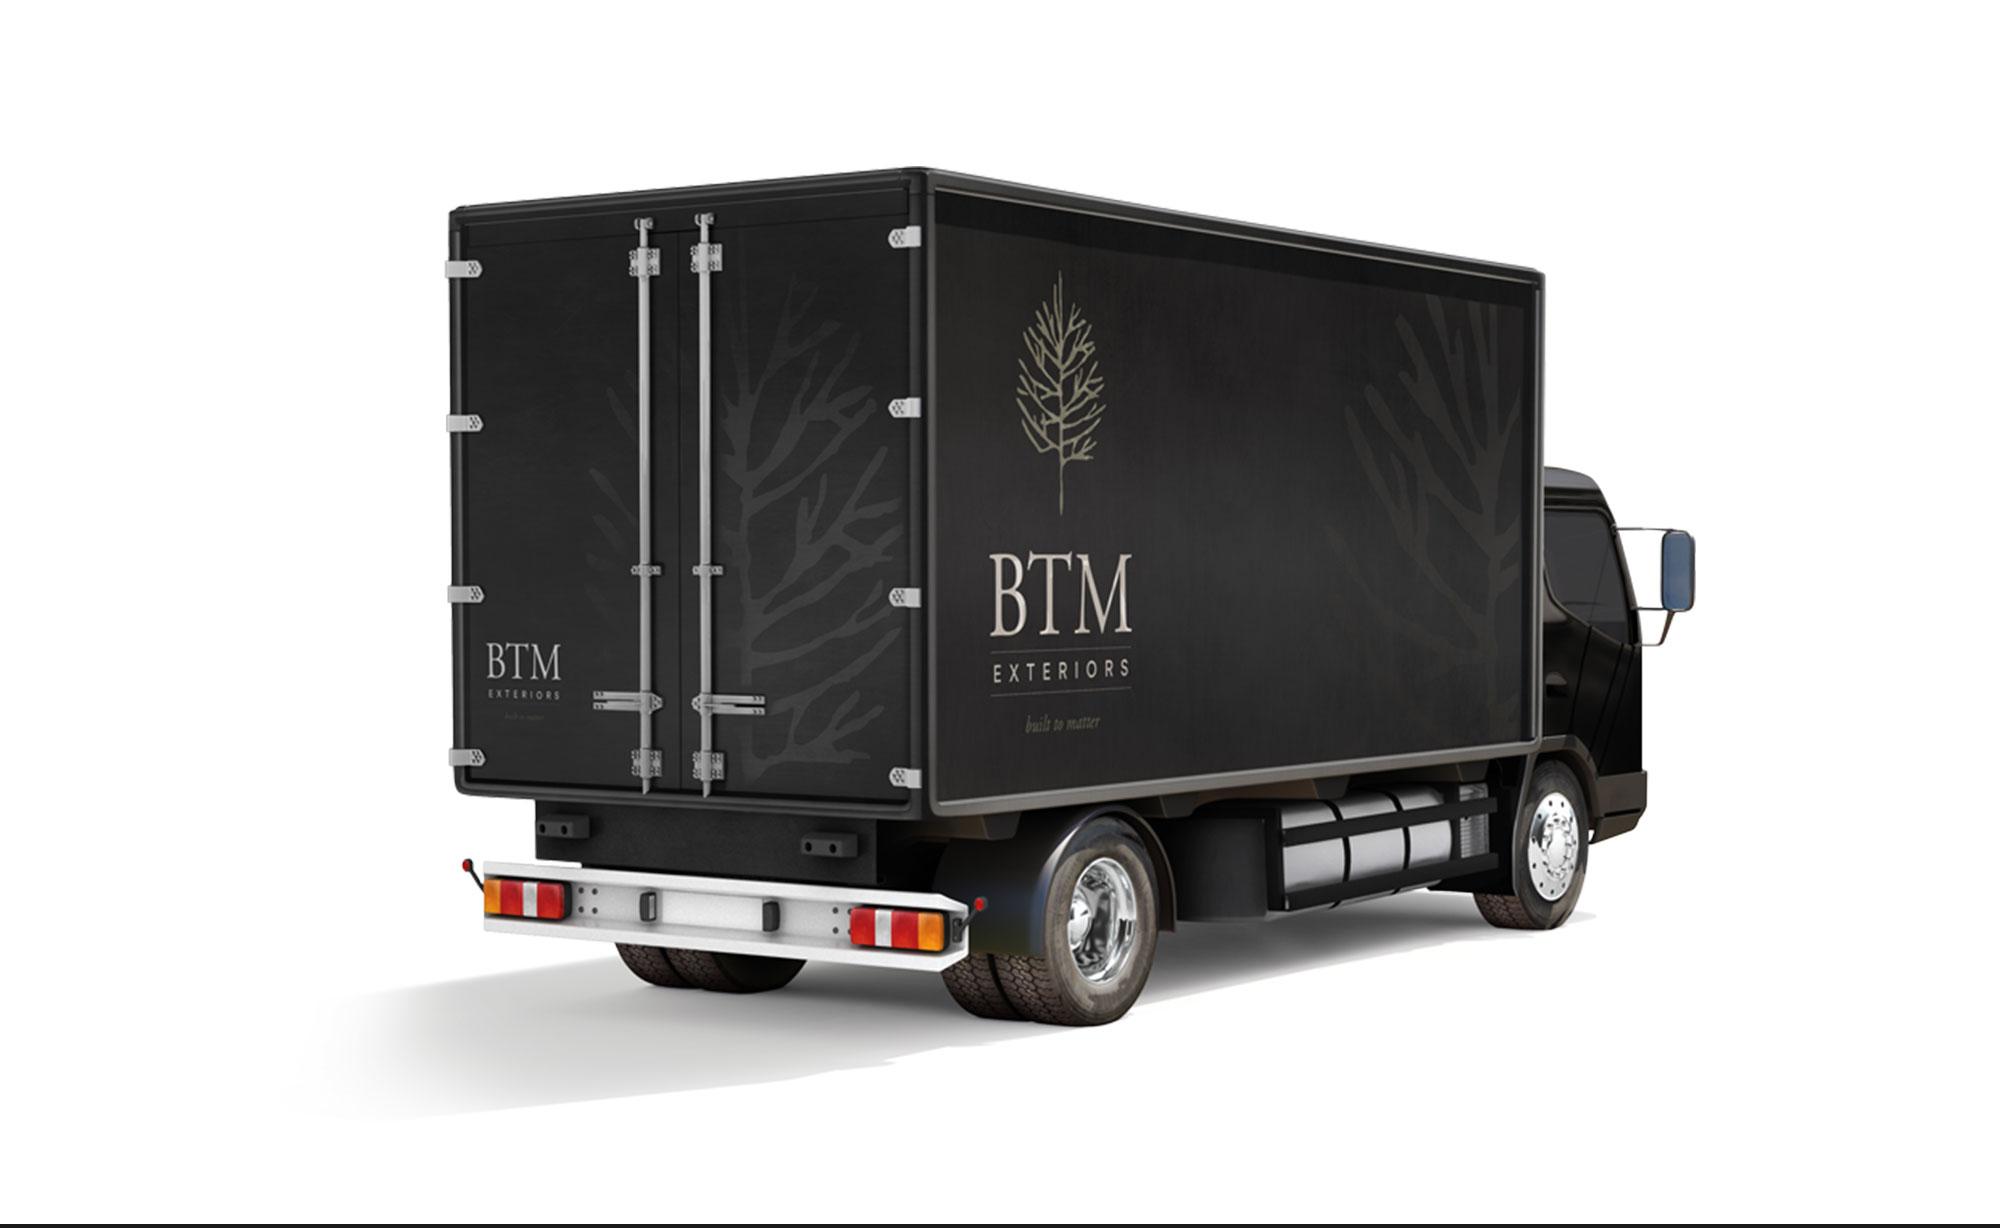 ©-Chris-Rae-Design-BTM-Exteriors-Vehicle-Truck-Design-01.jpg